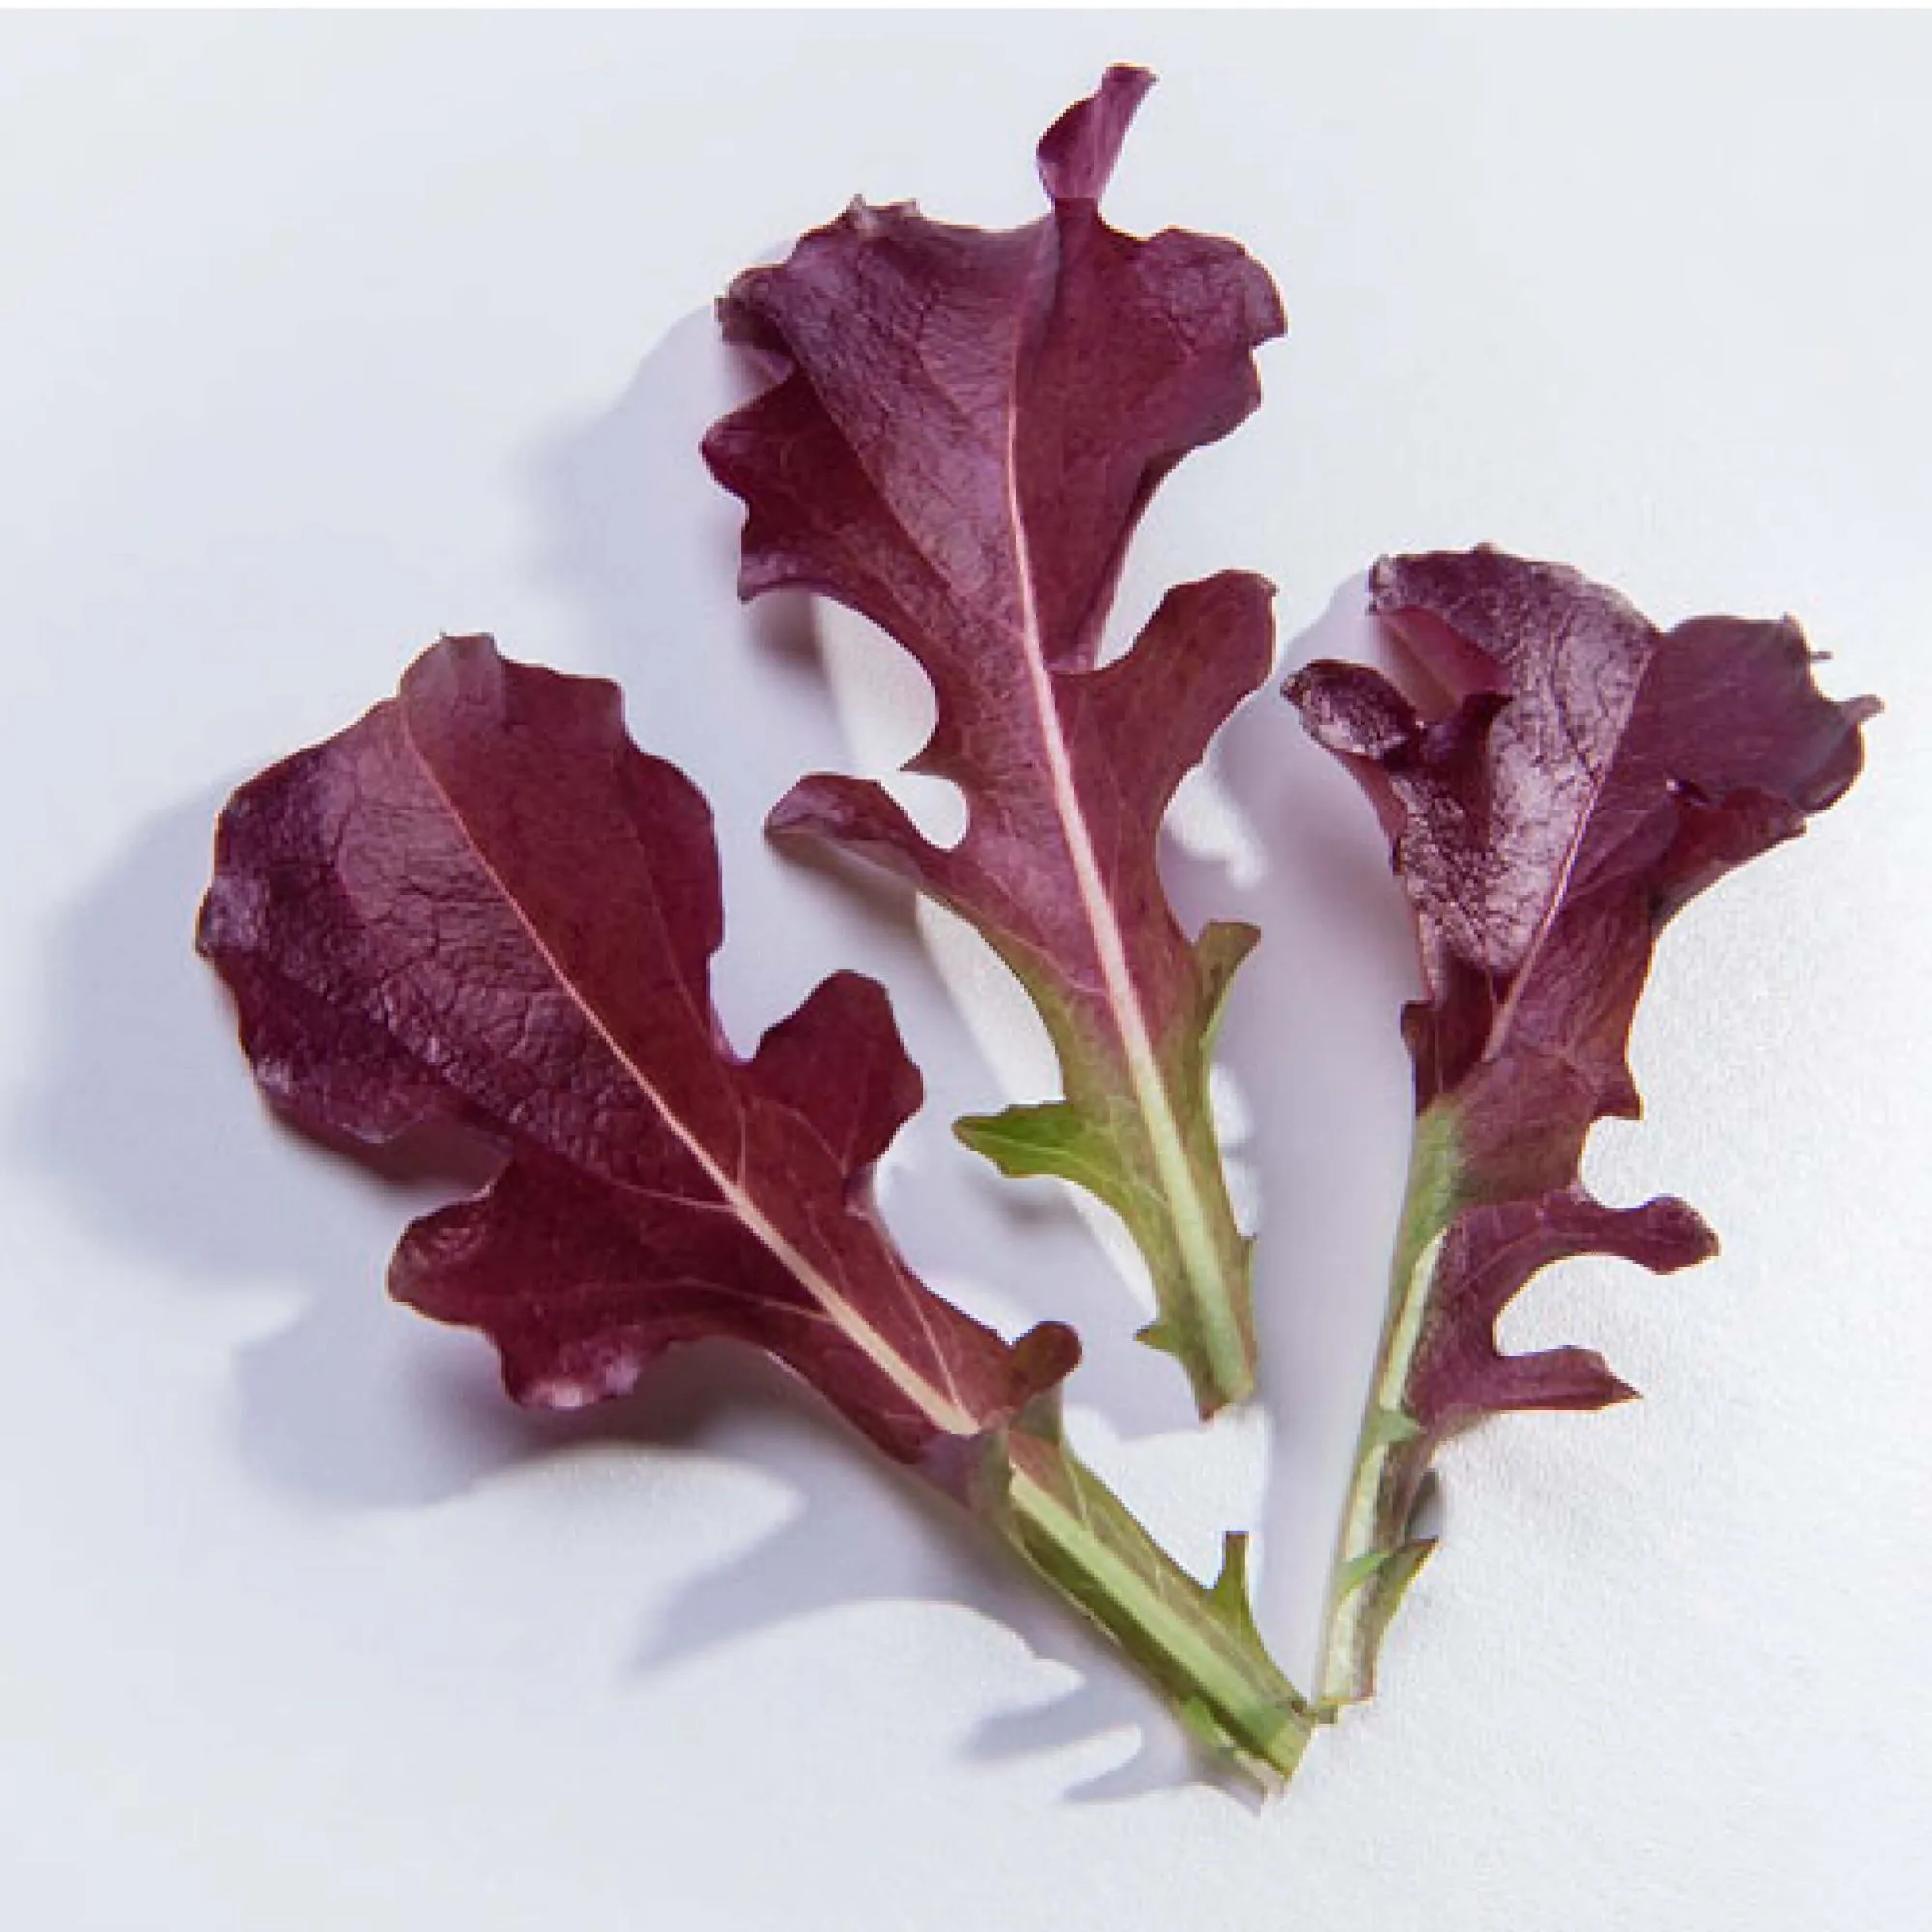 Sementes para plantar Alface Mimosa Roxa Baby Leaf em vasos autoirrigáveis RAIZ  - Vasos Raiz Loja Oficial